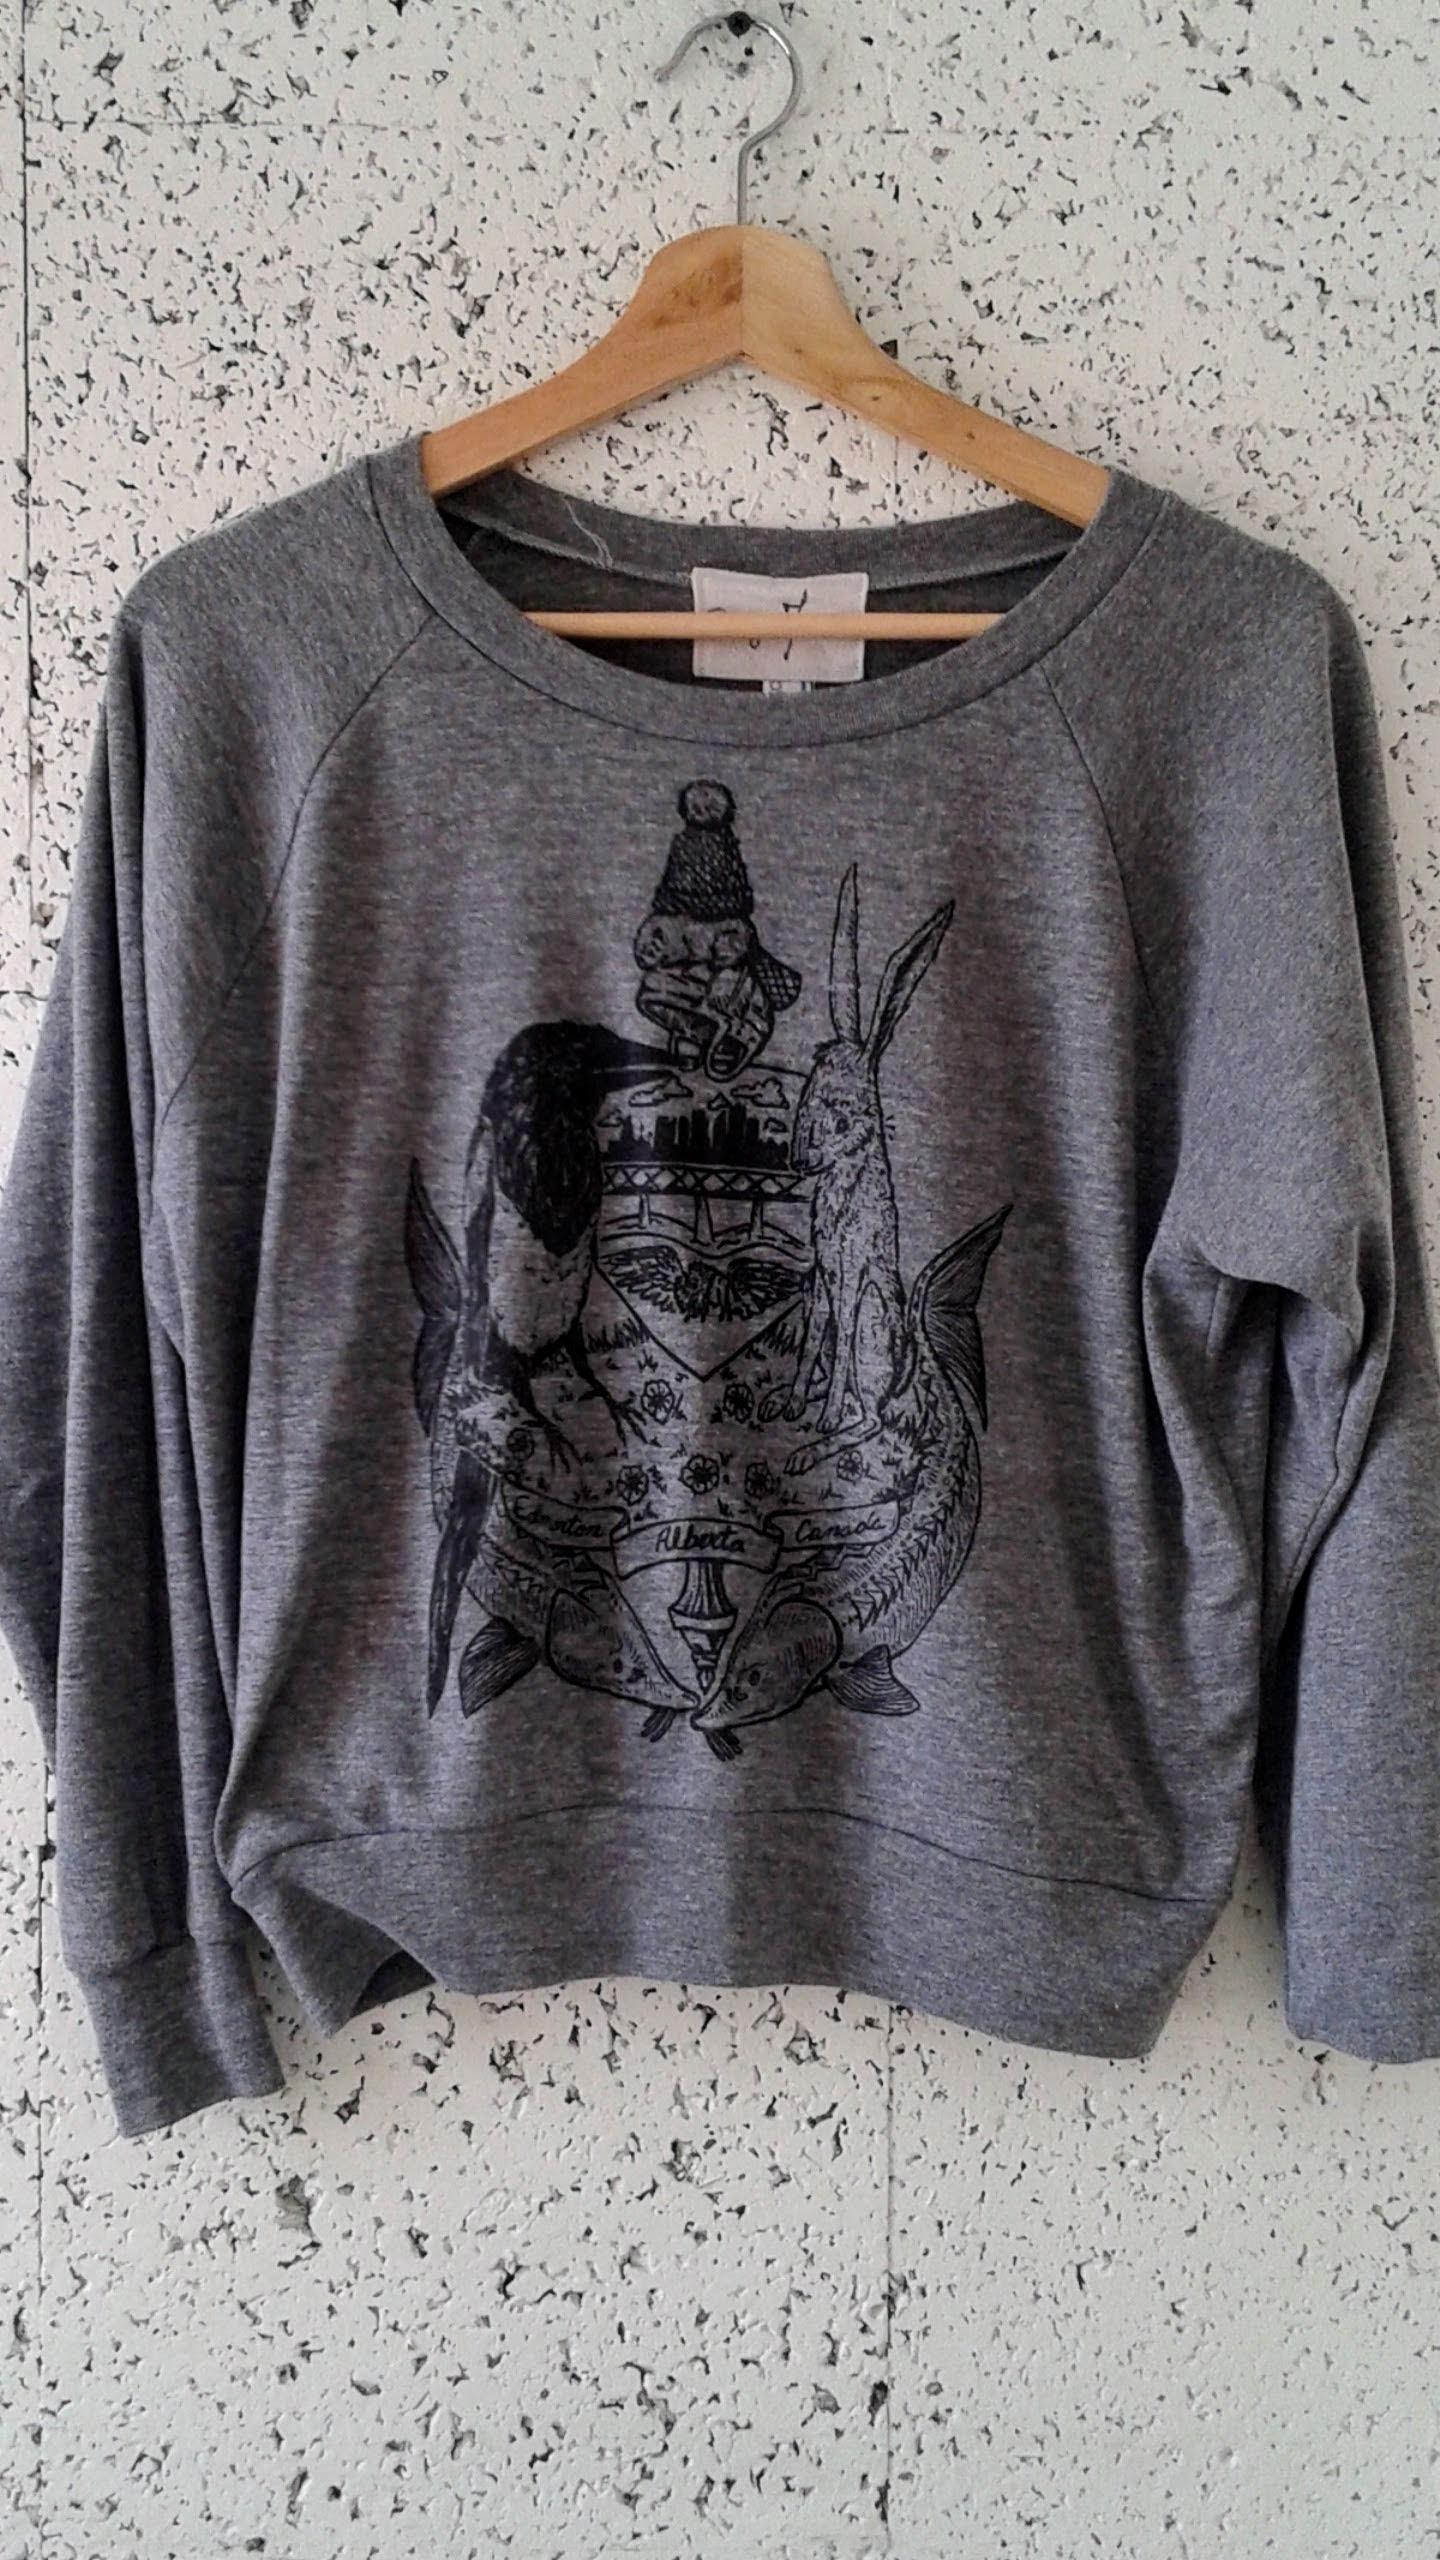 Salgado Fenwick top; Size S, $24